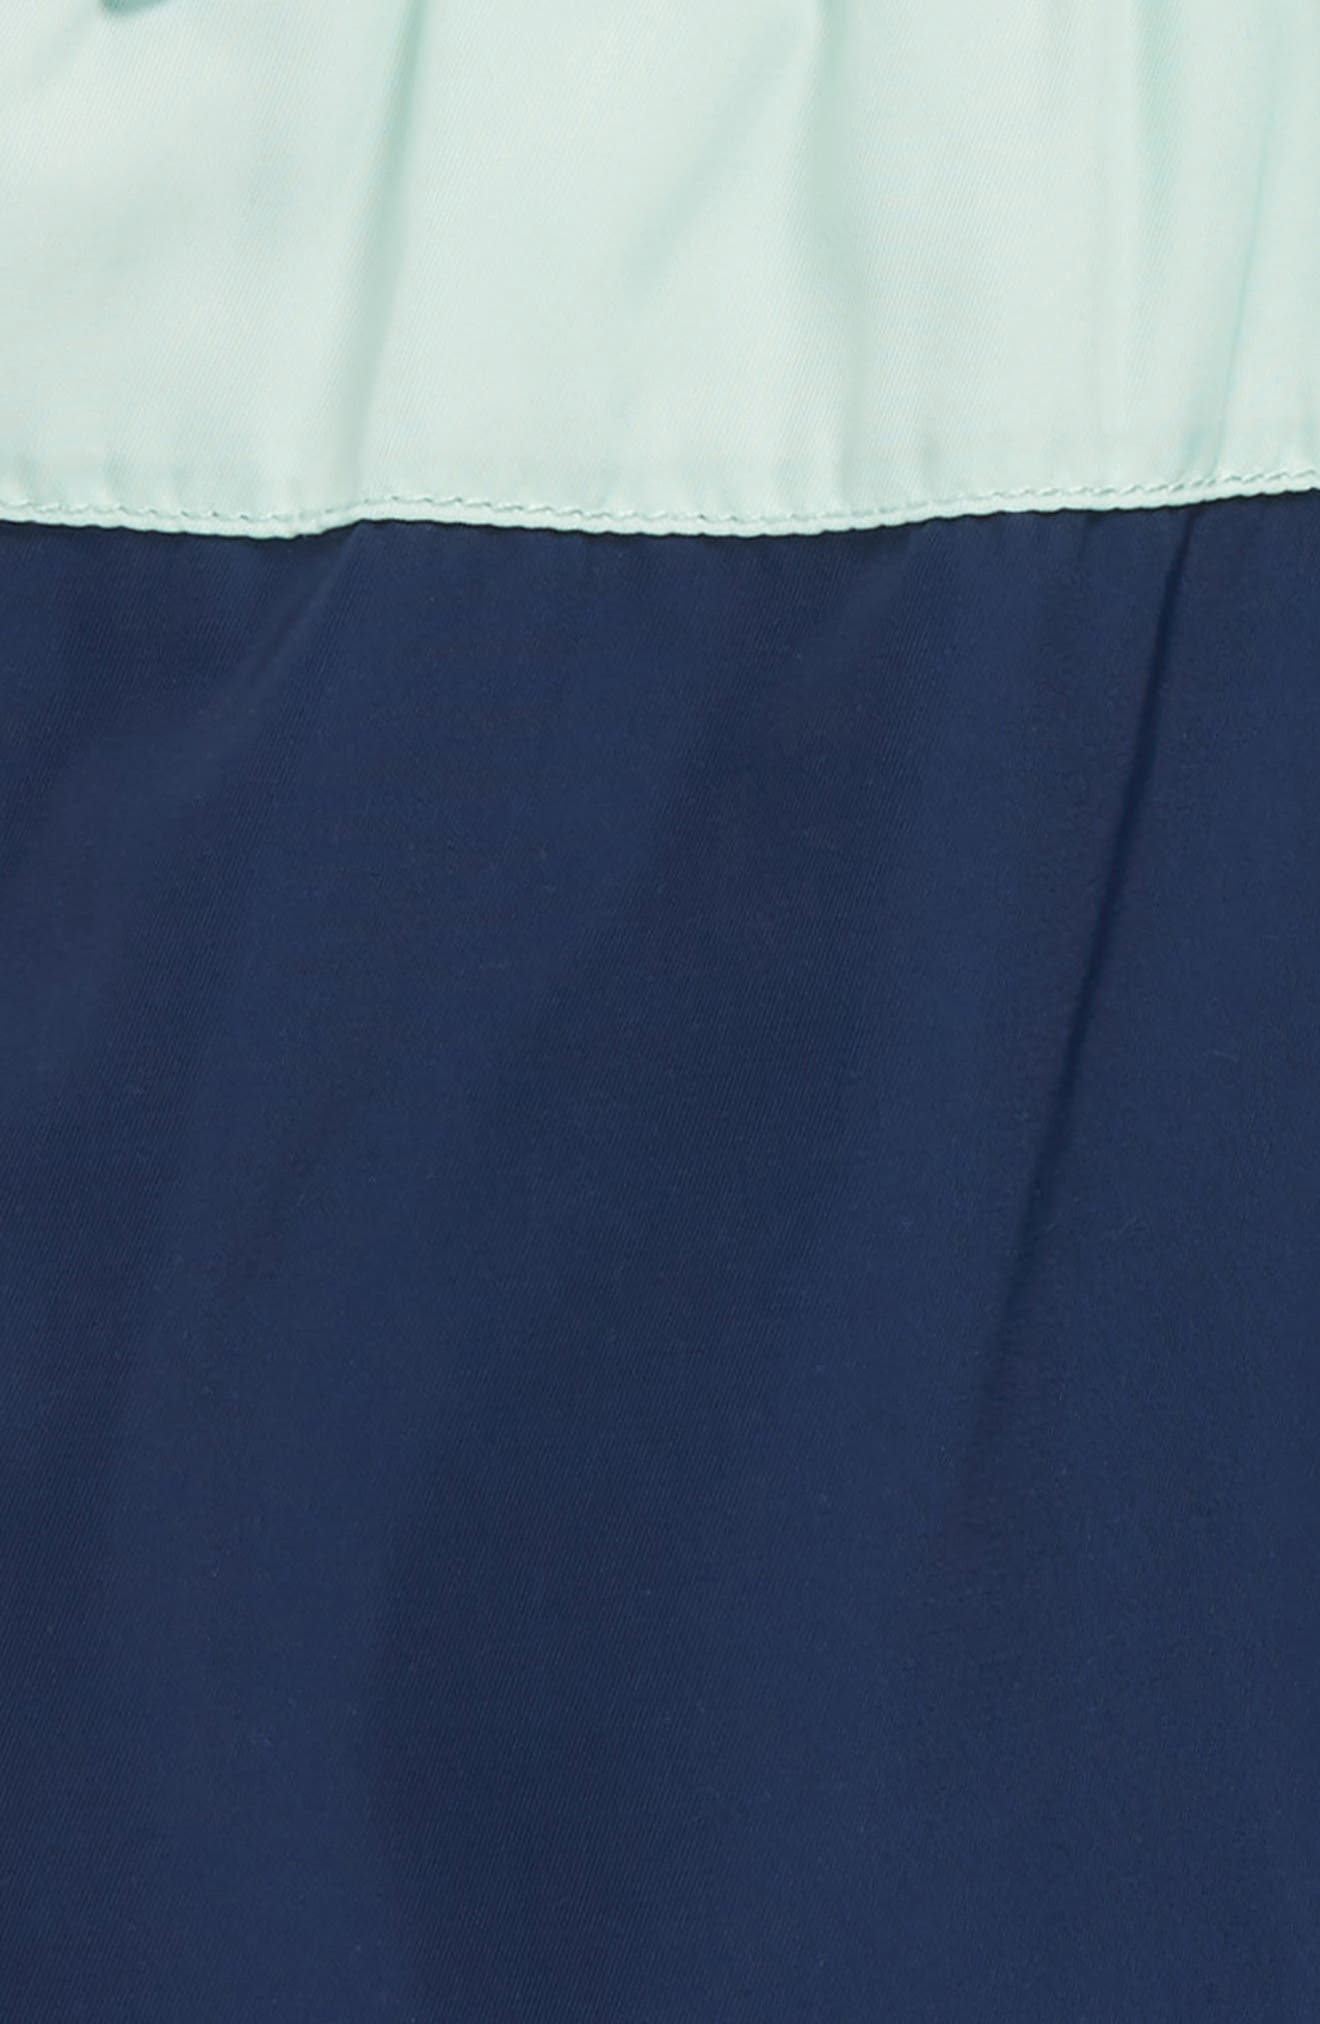 Colorblock Swim Trunks,                             Alternate thumbnail 2, color,                             Blue